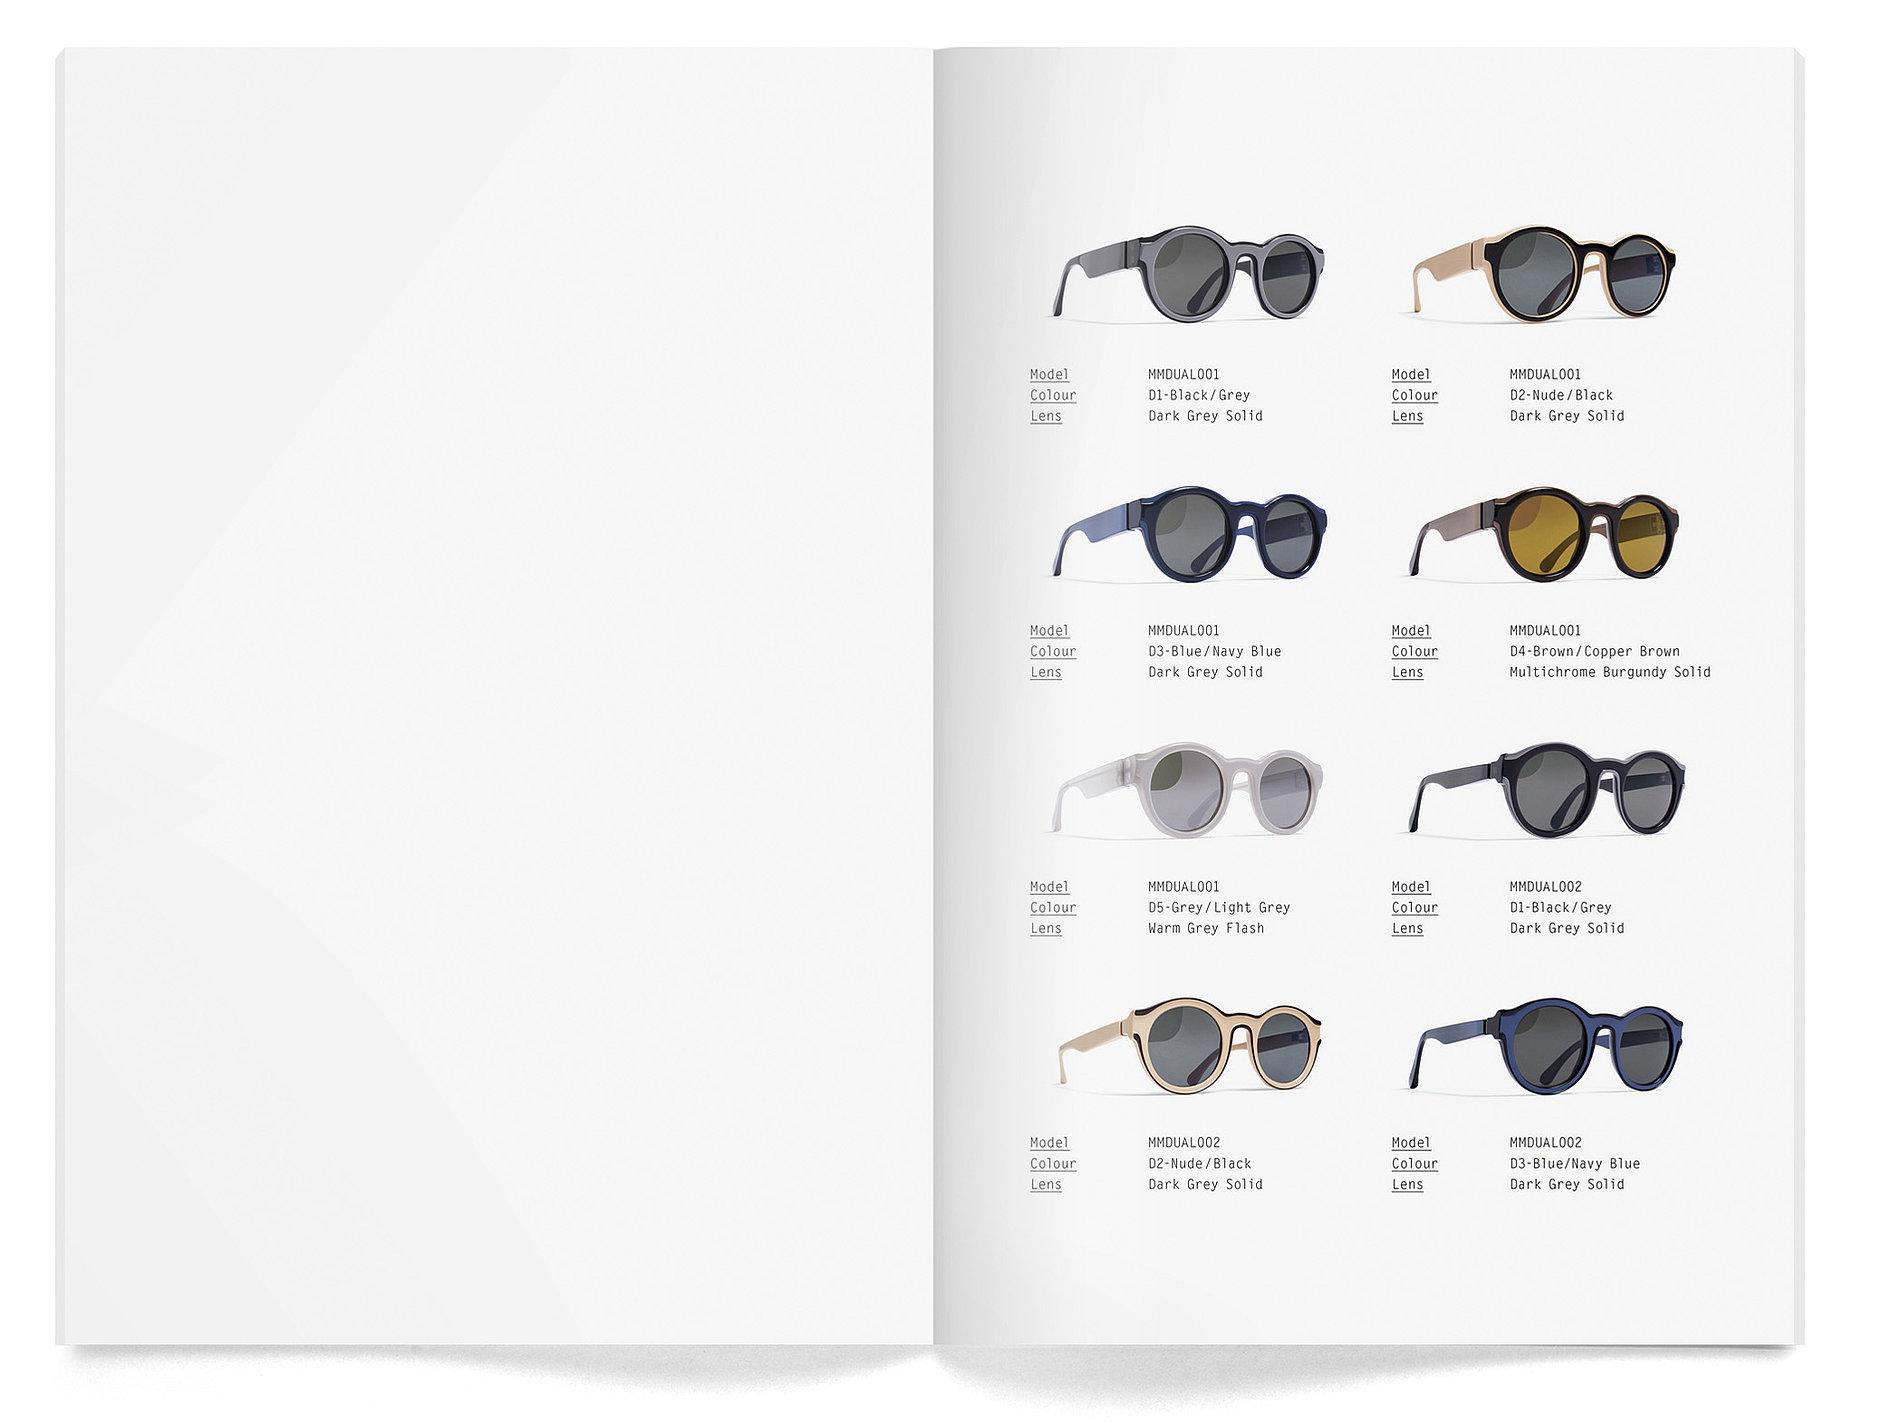 MYKITA + Maison Margiela | Red Dot Design Award